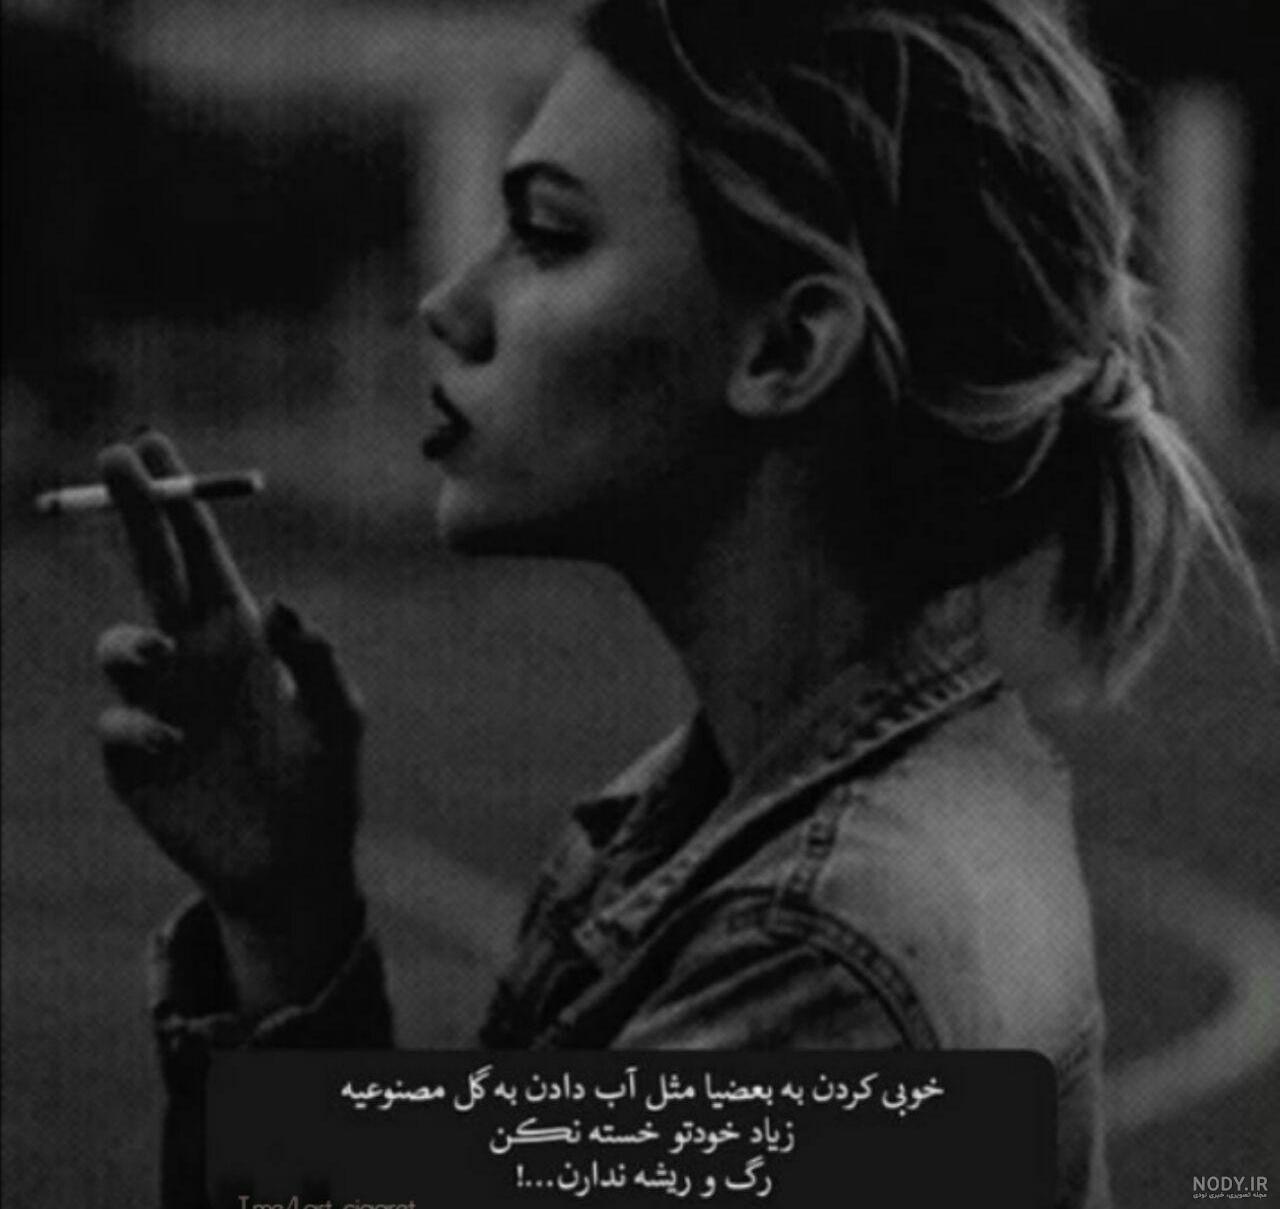 عکس غمگین سیگار